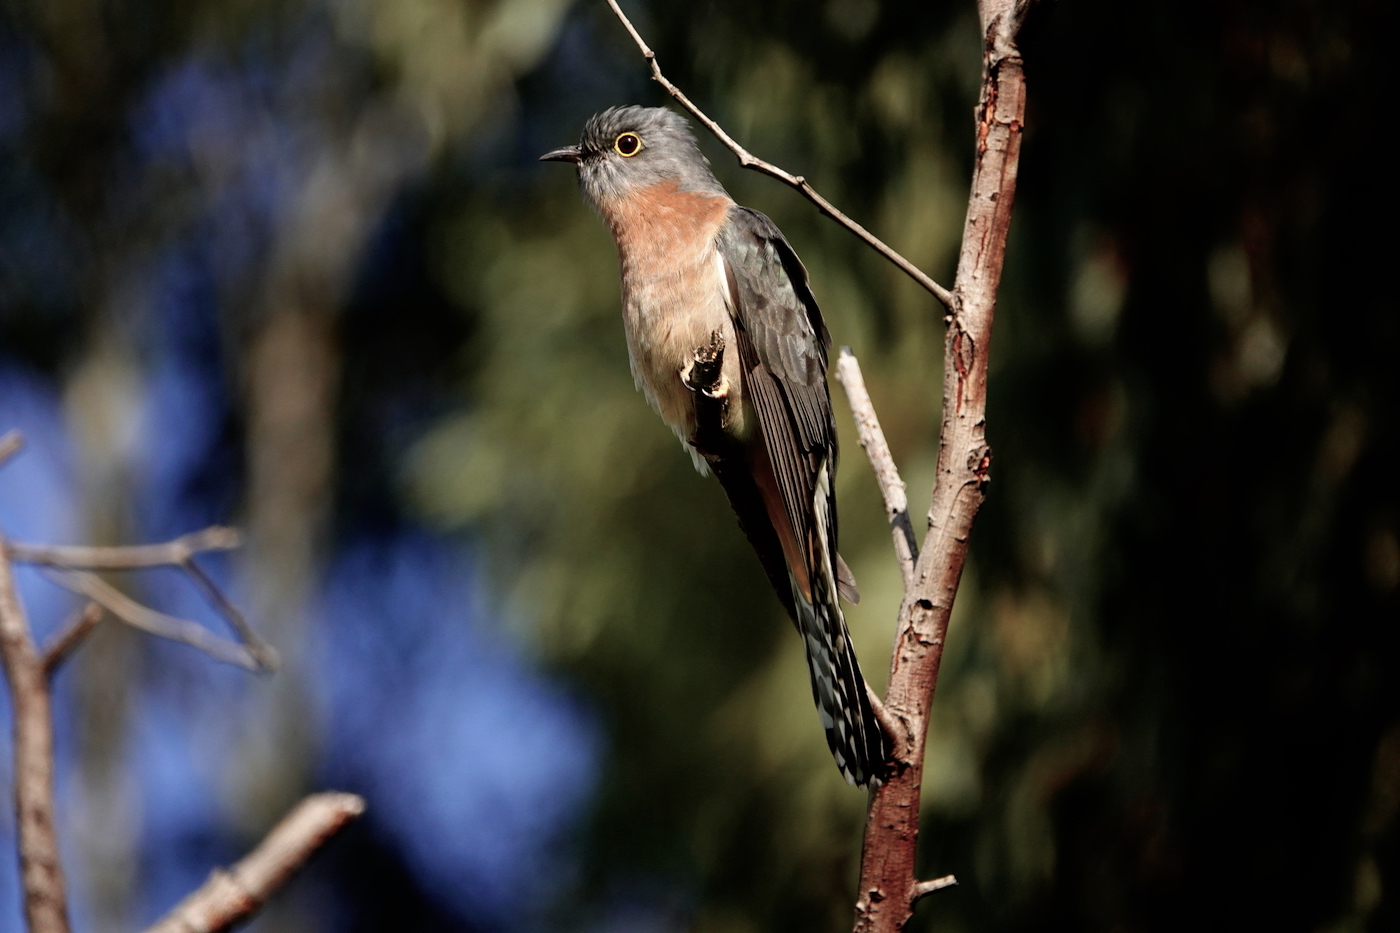 Fan-tailed Cuckoo (Image ID 37396)